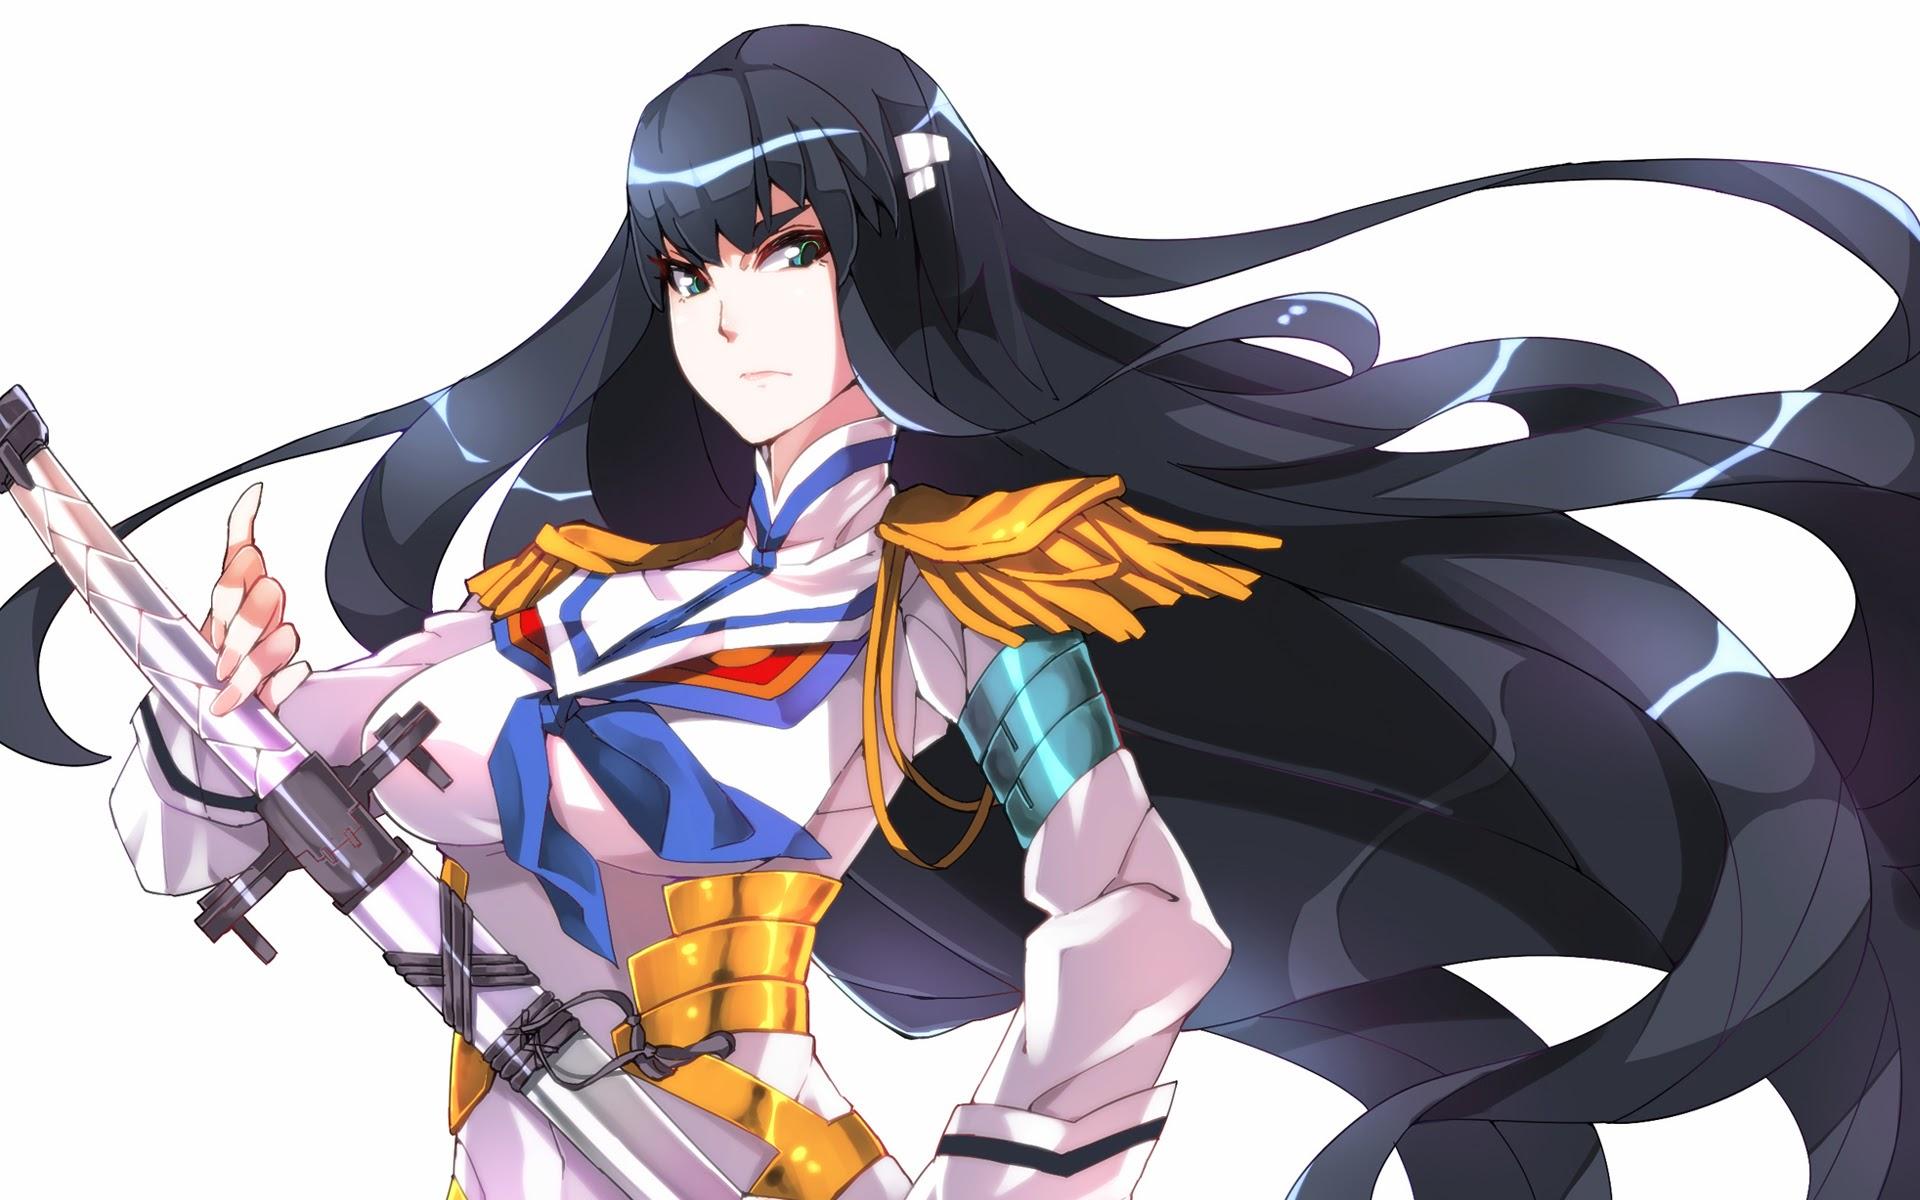 kiryuin satsuki kill la kill anime girl image hd wallpaper 1920x1200 1920x1200